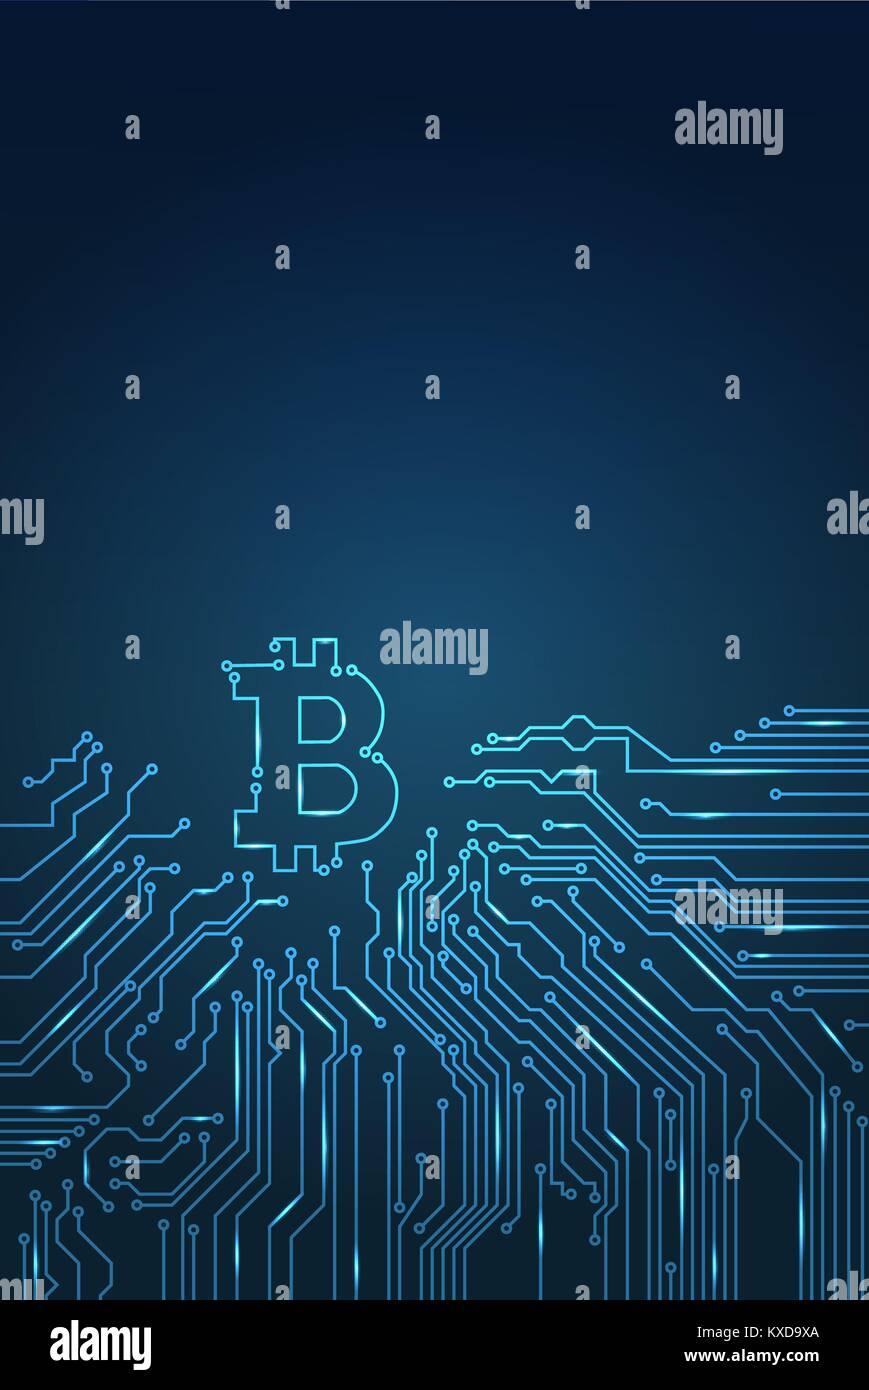 Digitale bitcoin crypto Währung vector Hintergrund. Stockbild